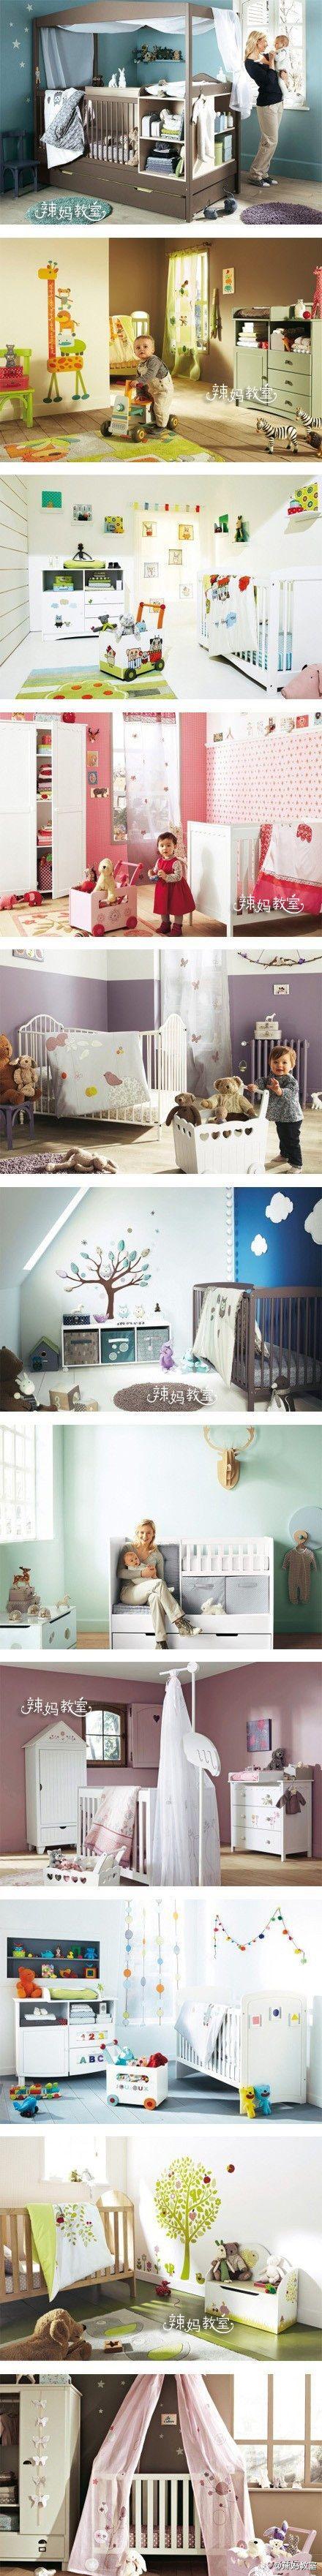 best baby shower images on Pinterest Pregnancy Babies stuff